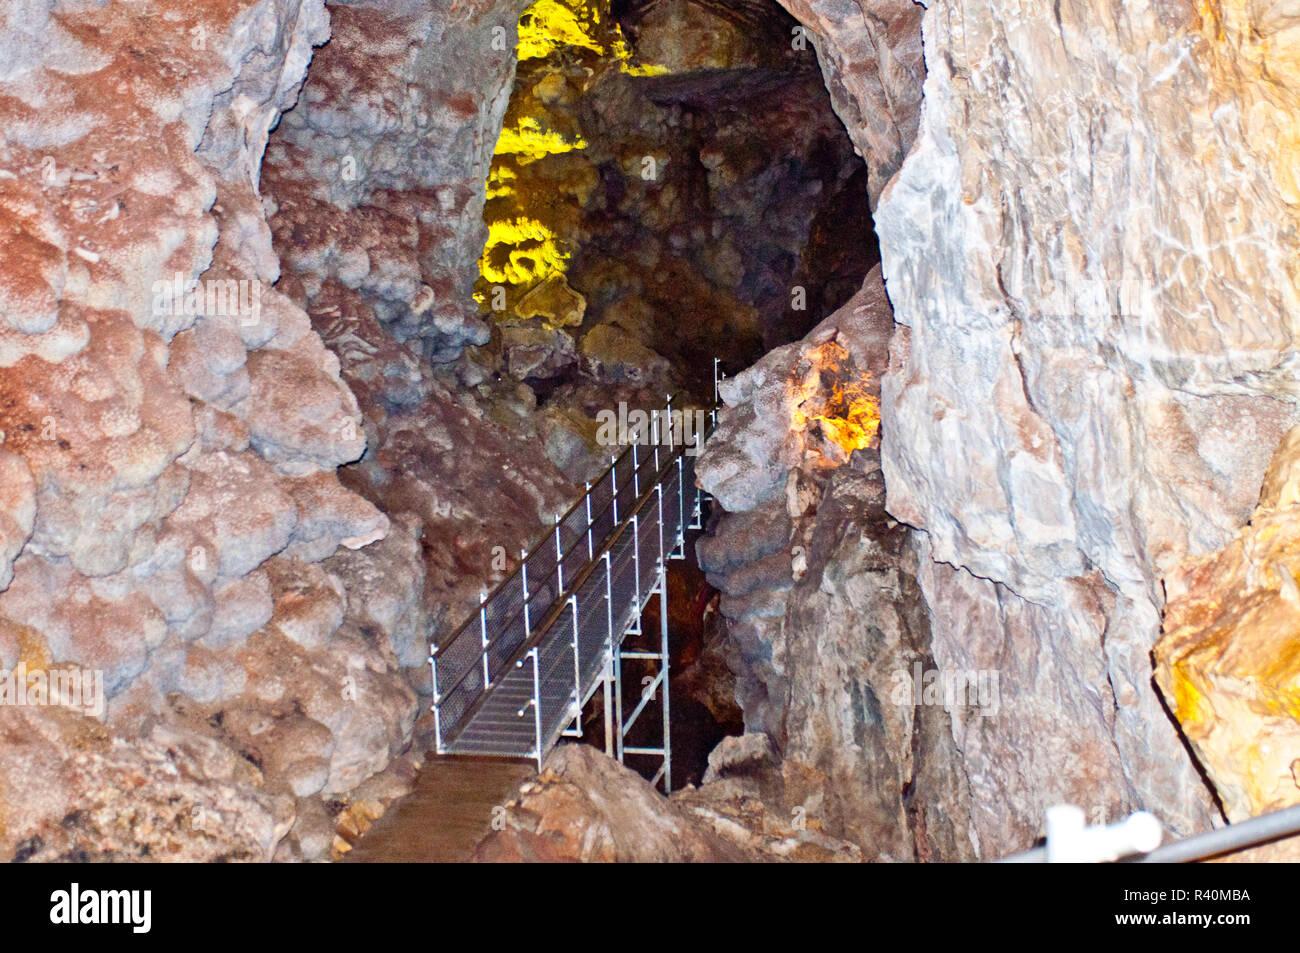 USA, South Dakota, Custer, Jewel Cave National Monument, Scenic Tour - Stock Image